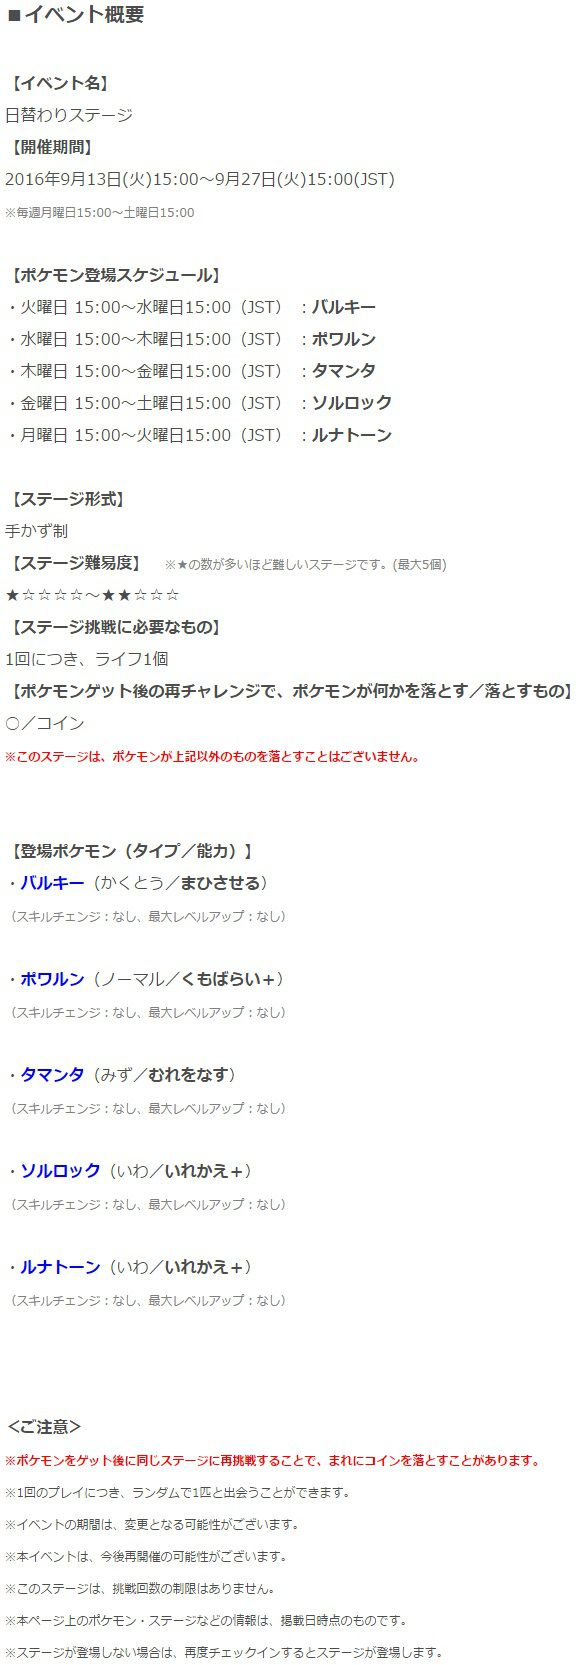 image_6453.jpg